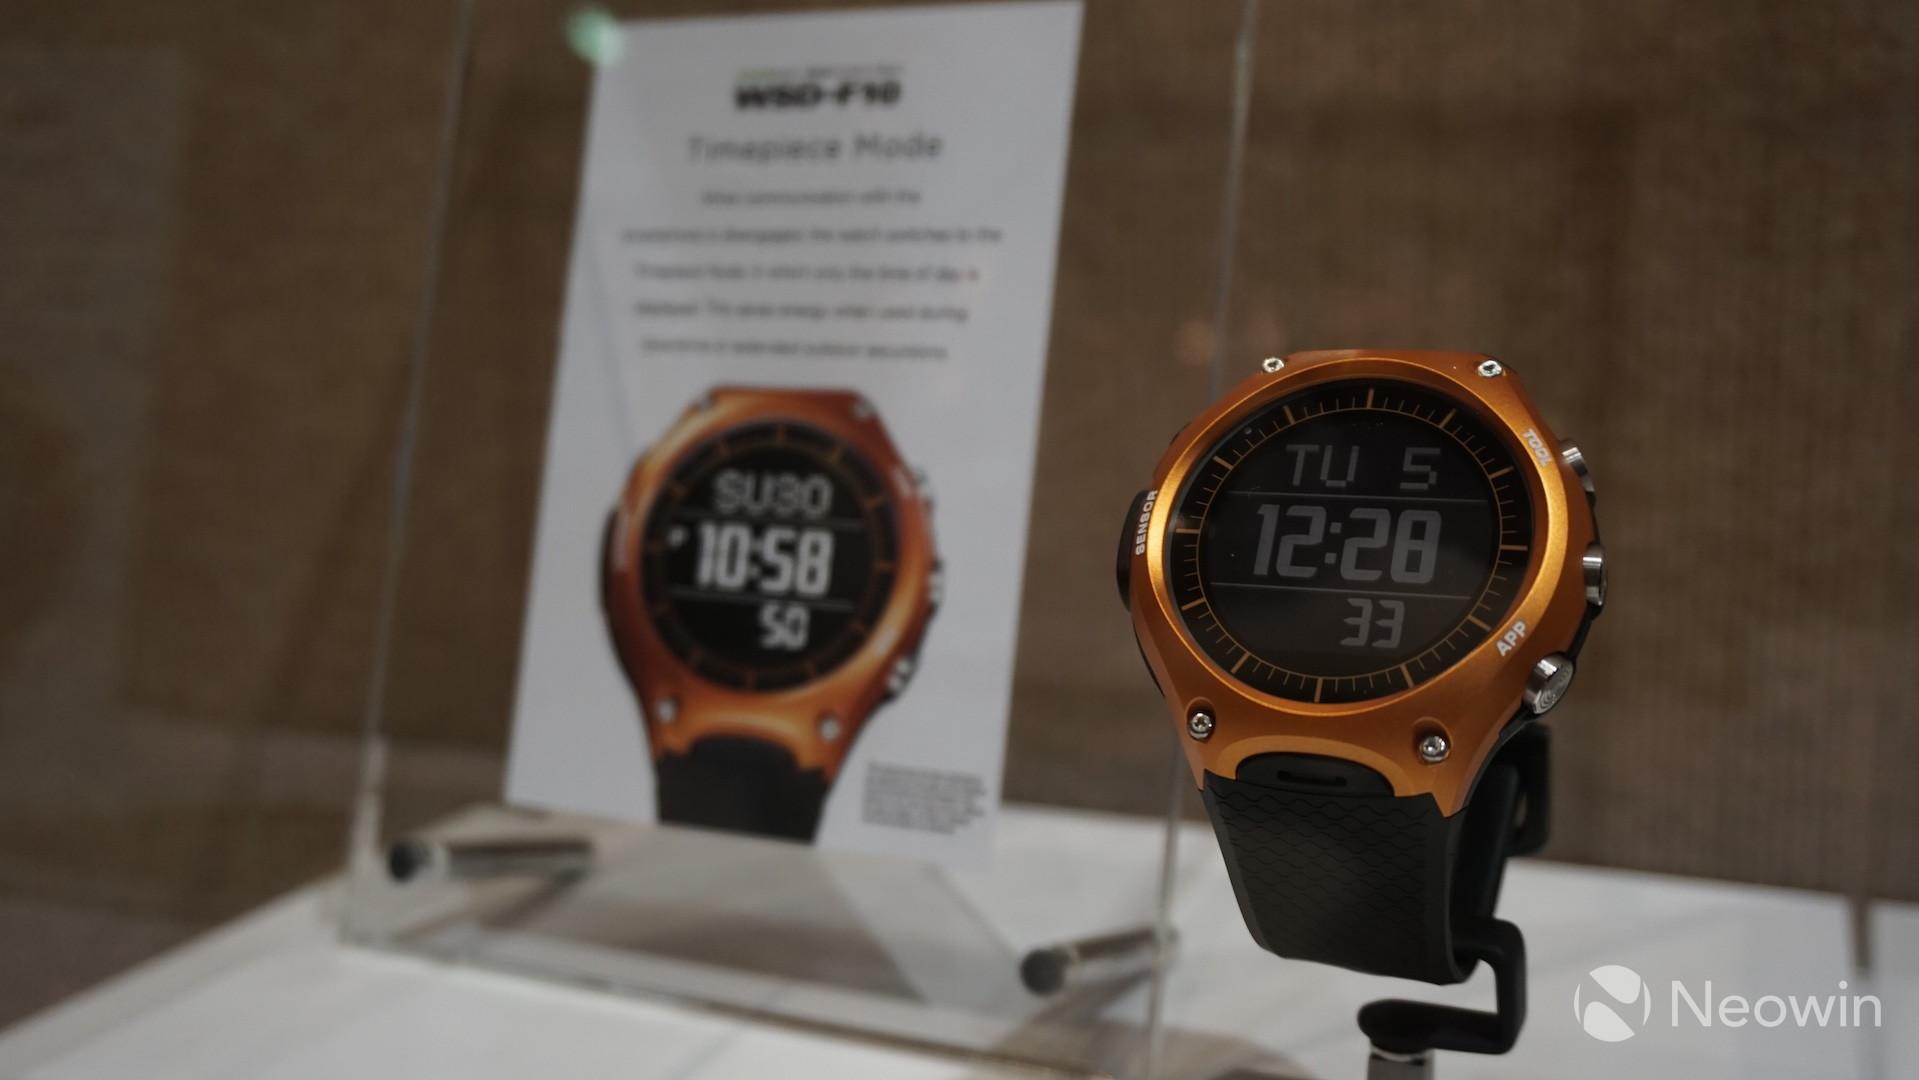 com iwz sports volemer no smart products remote watch rug rugged monitor waterproof sleep rate sport gps camera heart smartwatch iwantzone